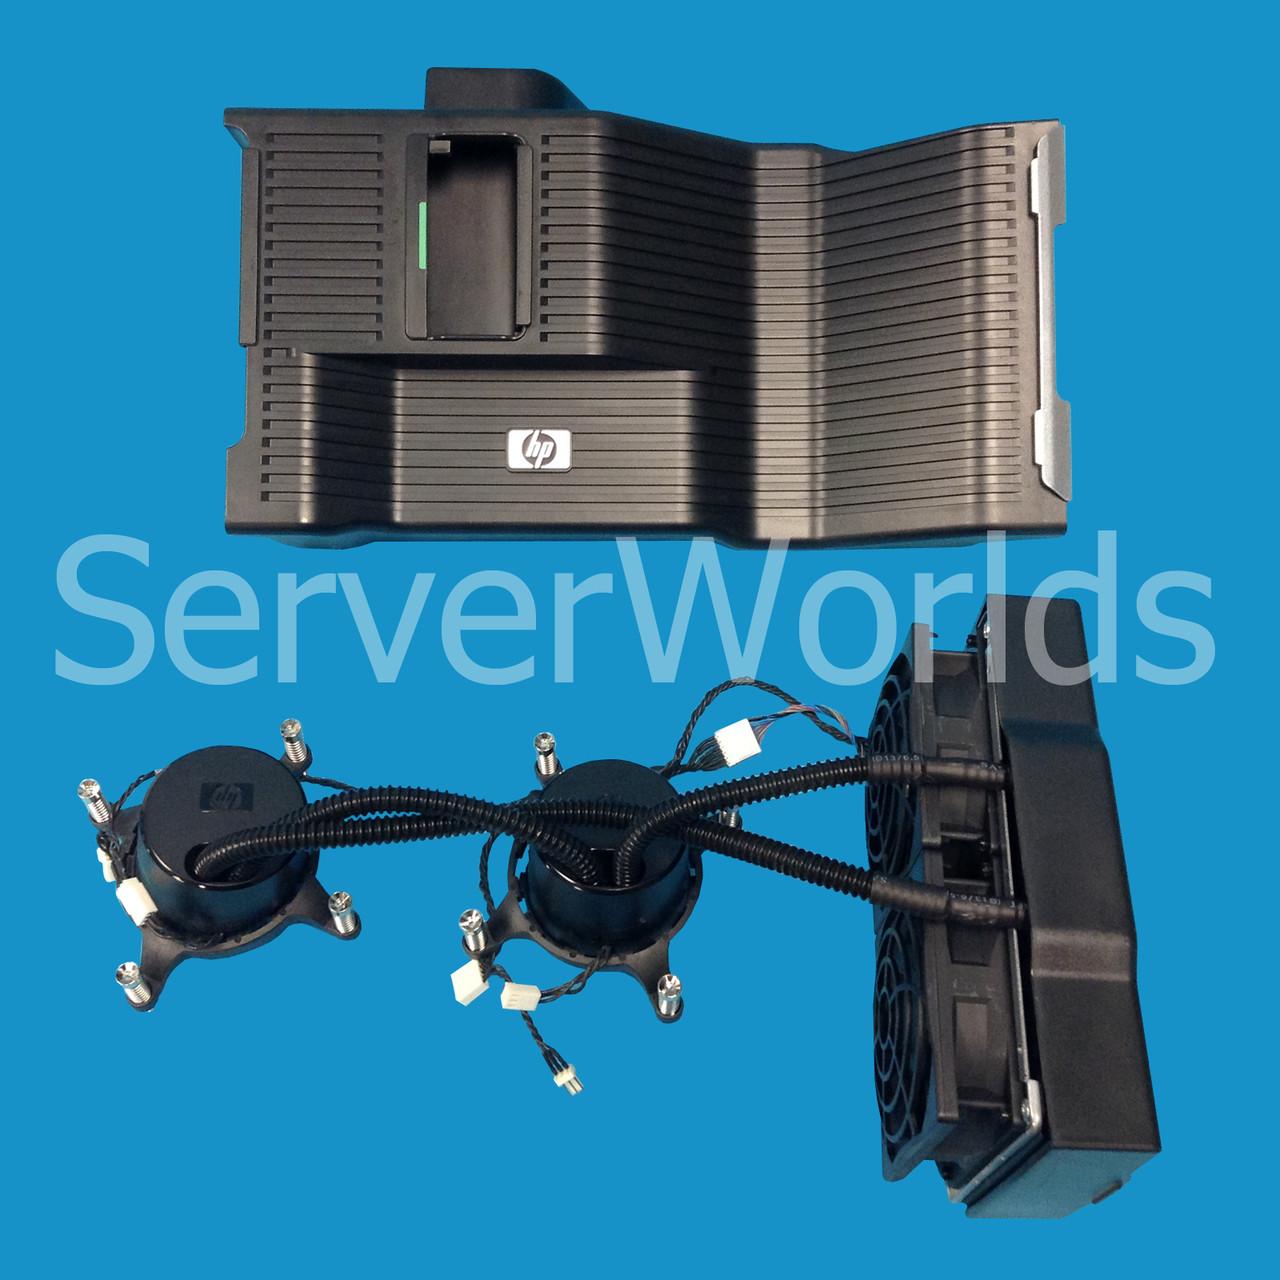 HP 507697-002 | Z800 Liquid Cooling Kit - Serverworlds